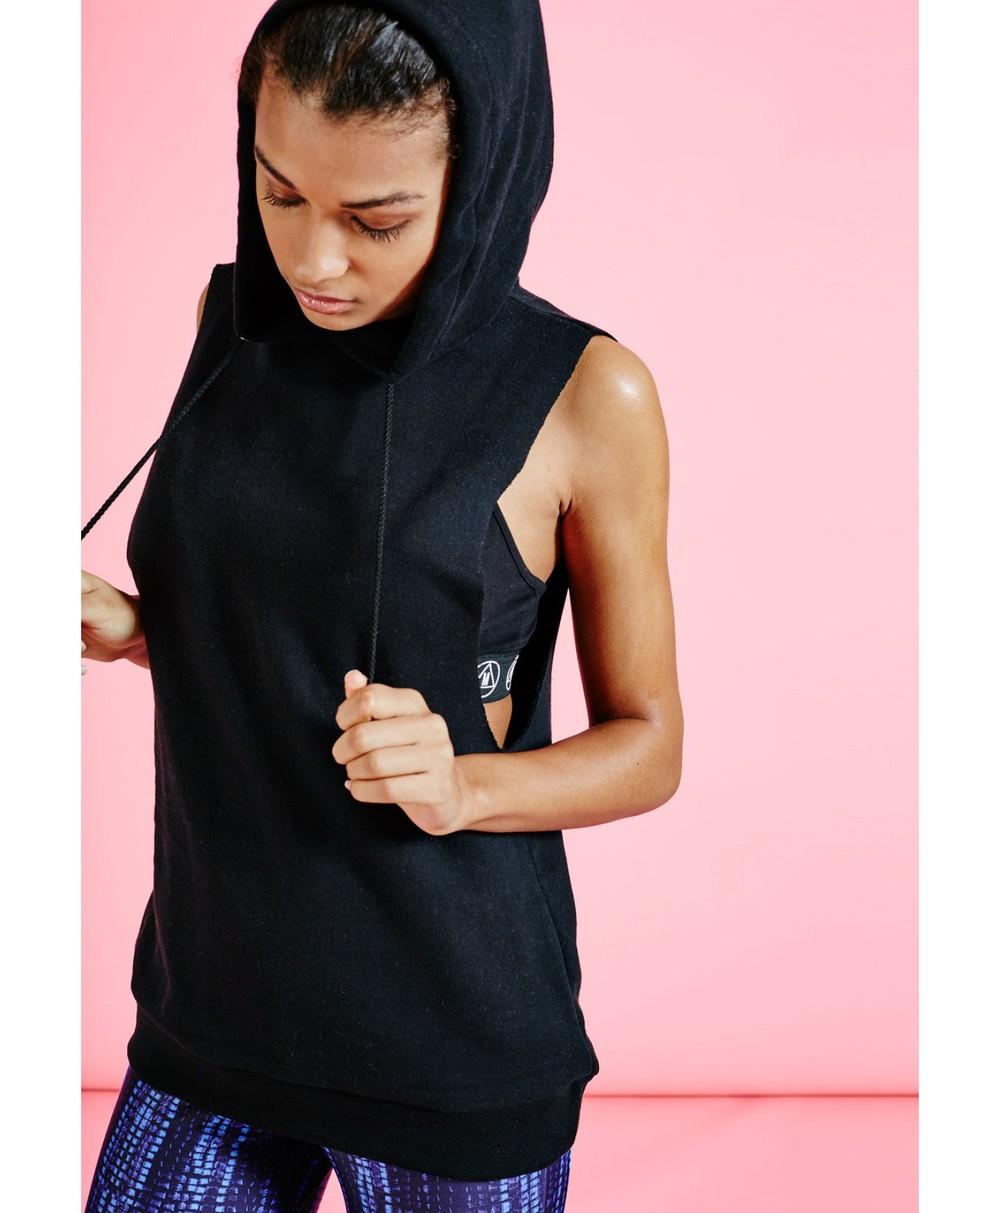 e3fe66150bc Trade Assurance Yihao 2015 Women Drop Armhole Sleeveless Sportswear Hooded  Gym Wear Hoodie Sweatshirt